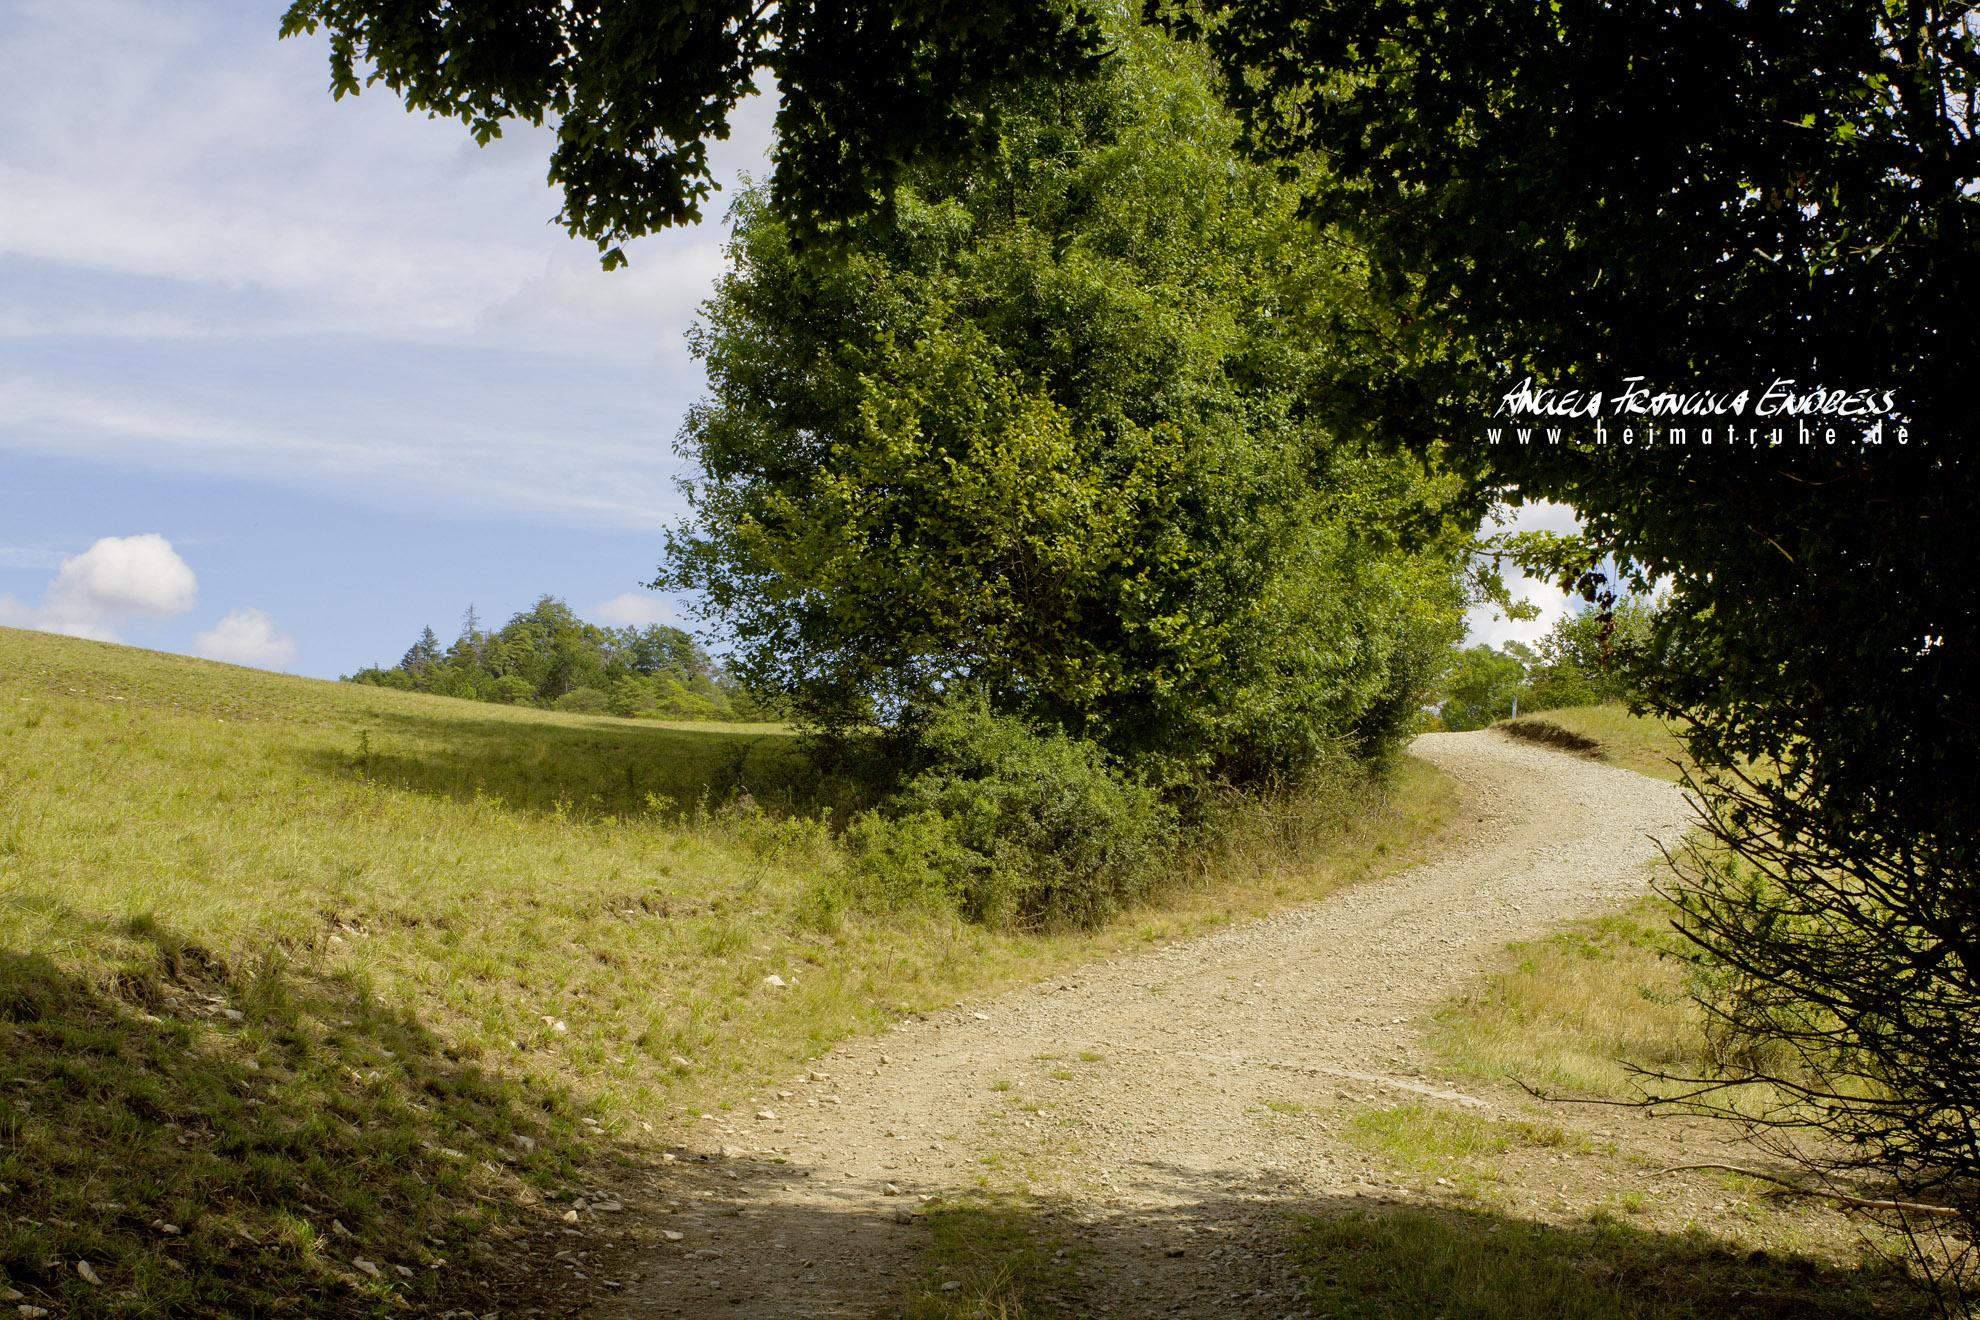 Weg Löwental Richtung Ützing, Stublang, Obermain Jura